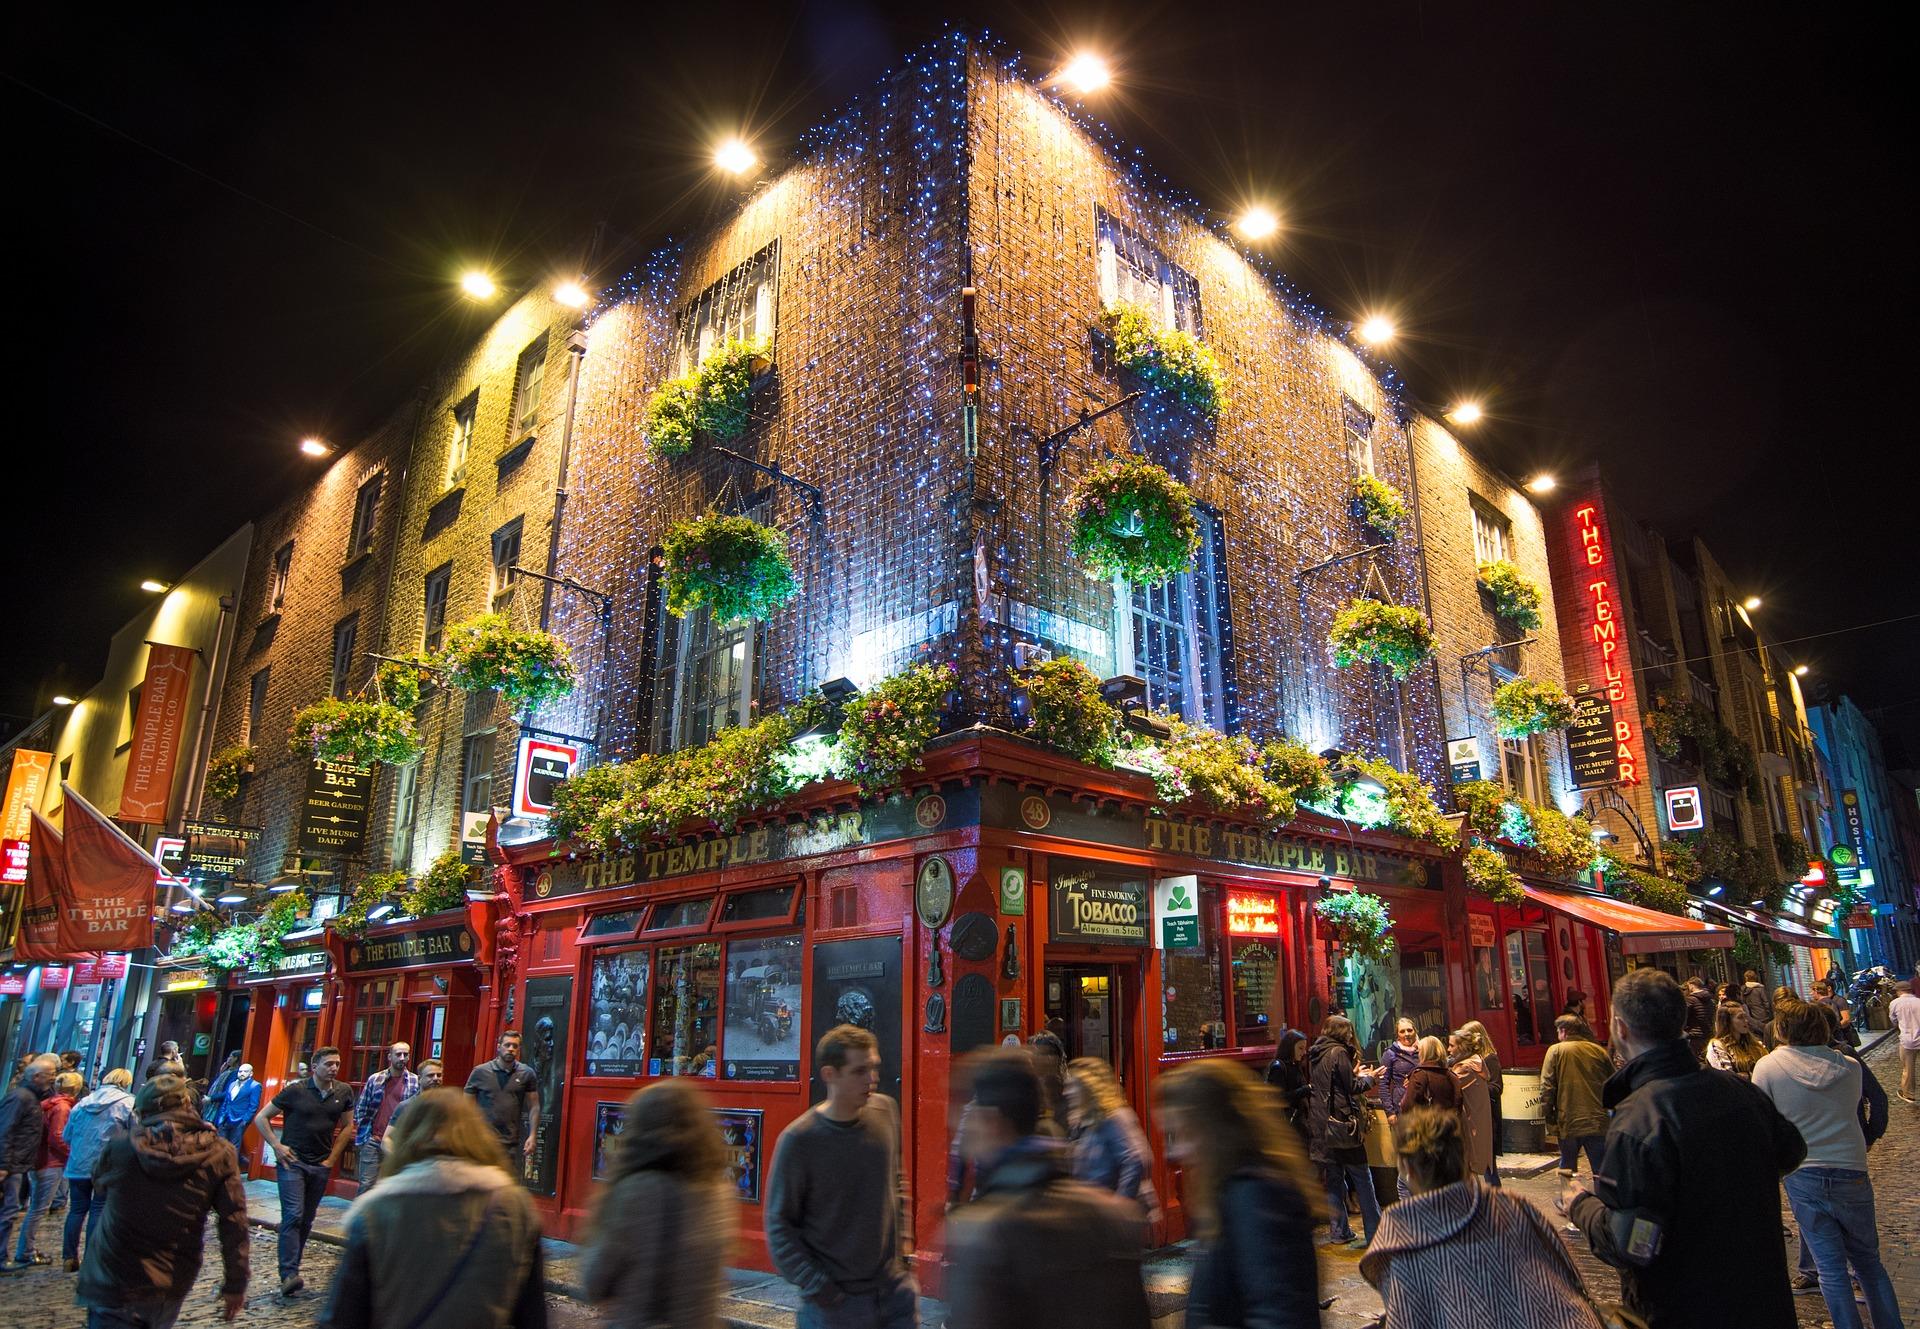 Image of Temple Bar area in Dublin